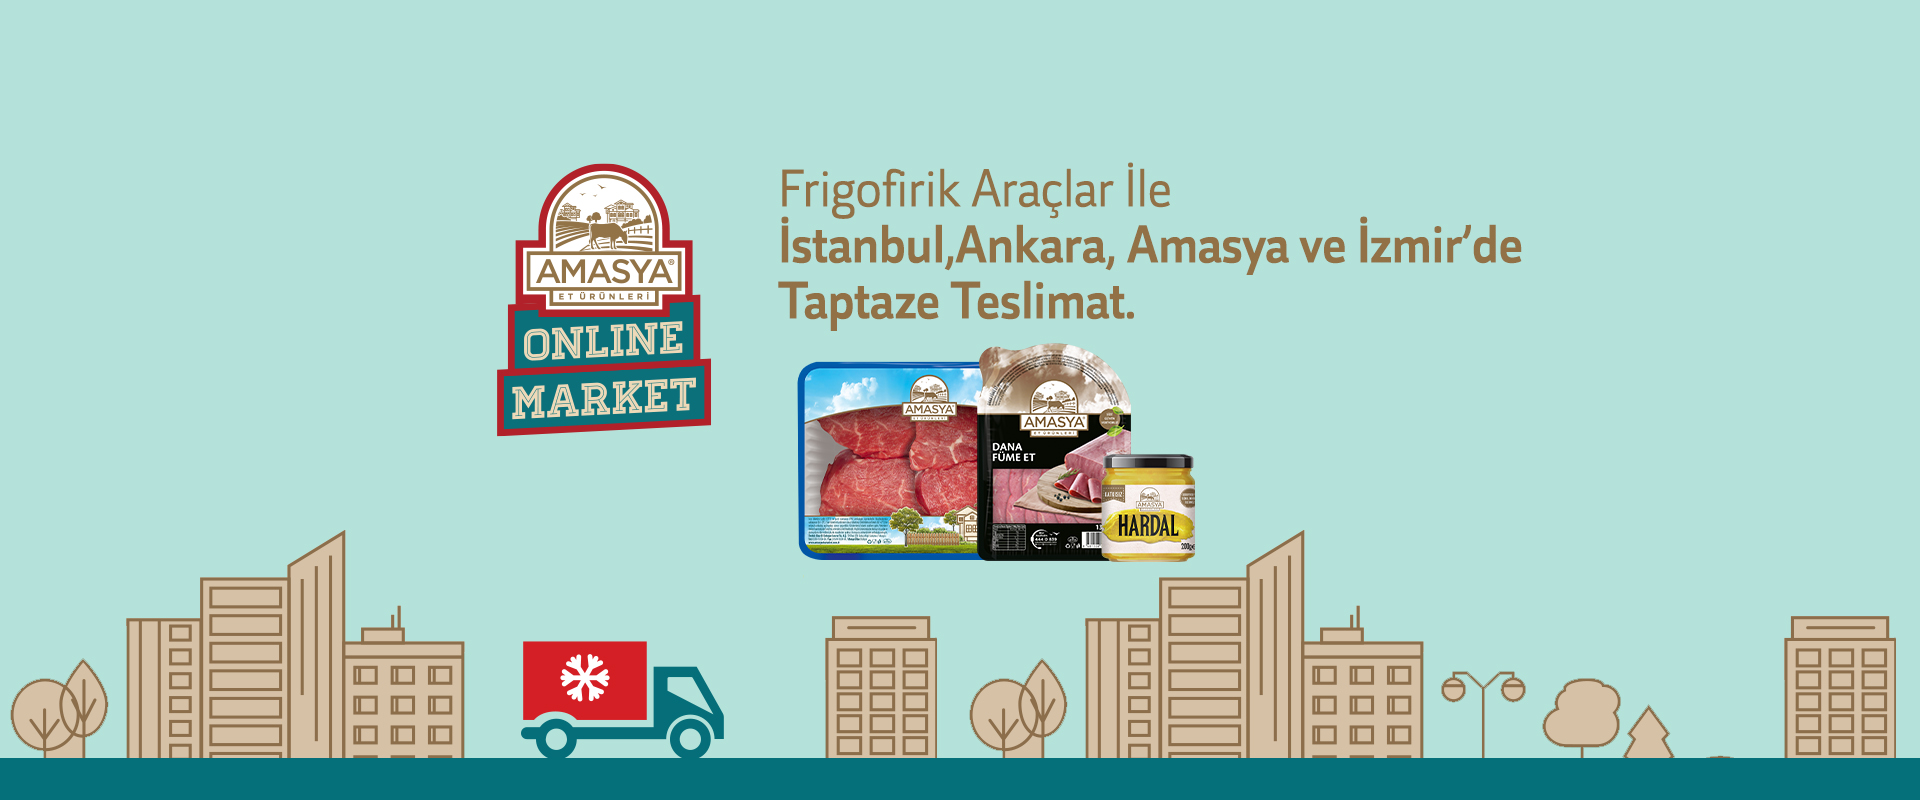 Aeu_4_Aralik_Online_Market_Slider2